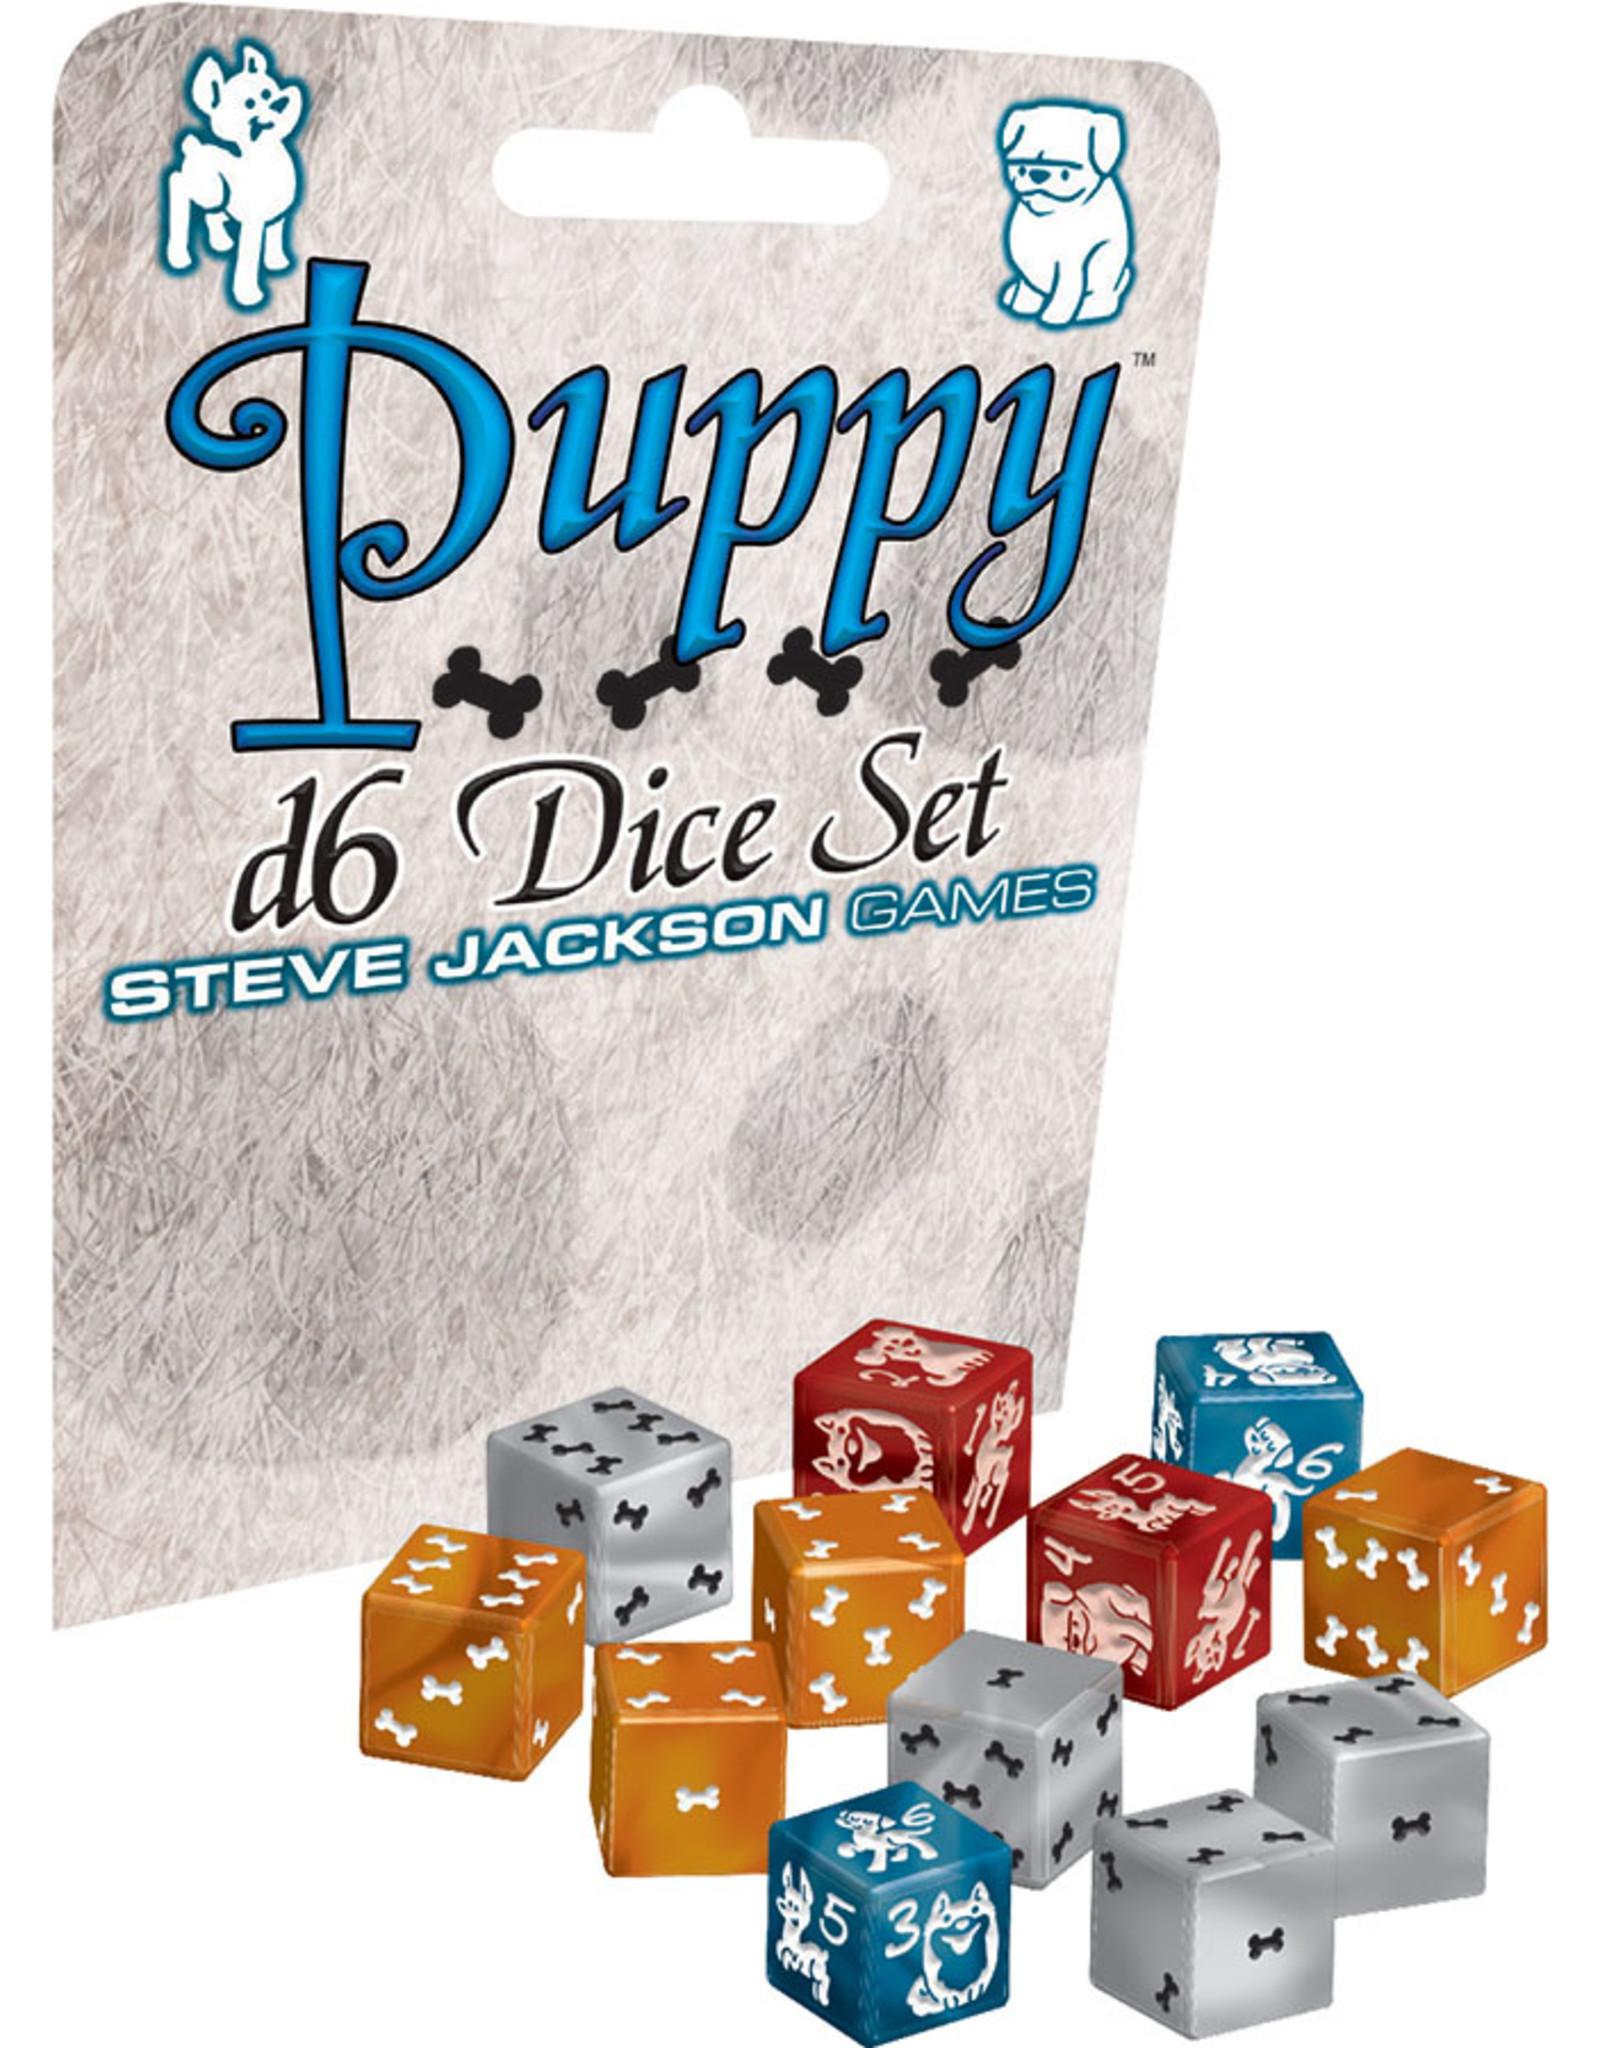 Steve Jackson Games Steve Jackson D6 Dice Sets